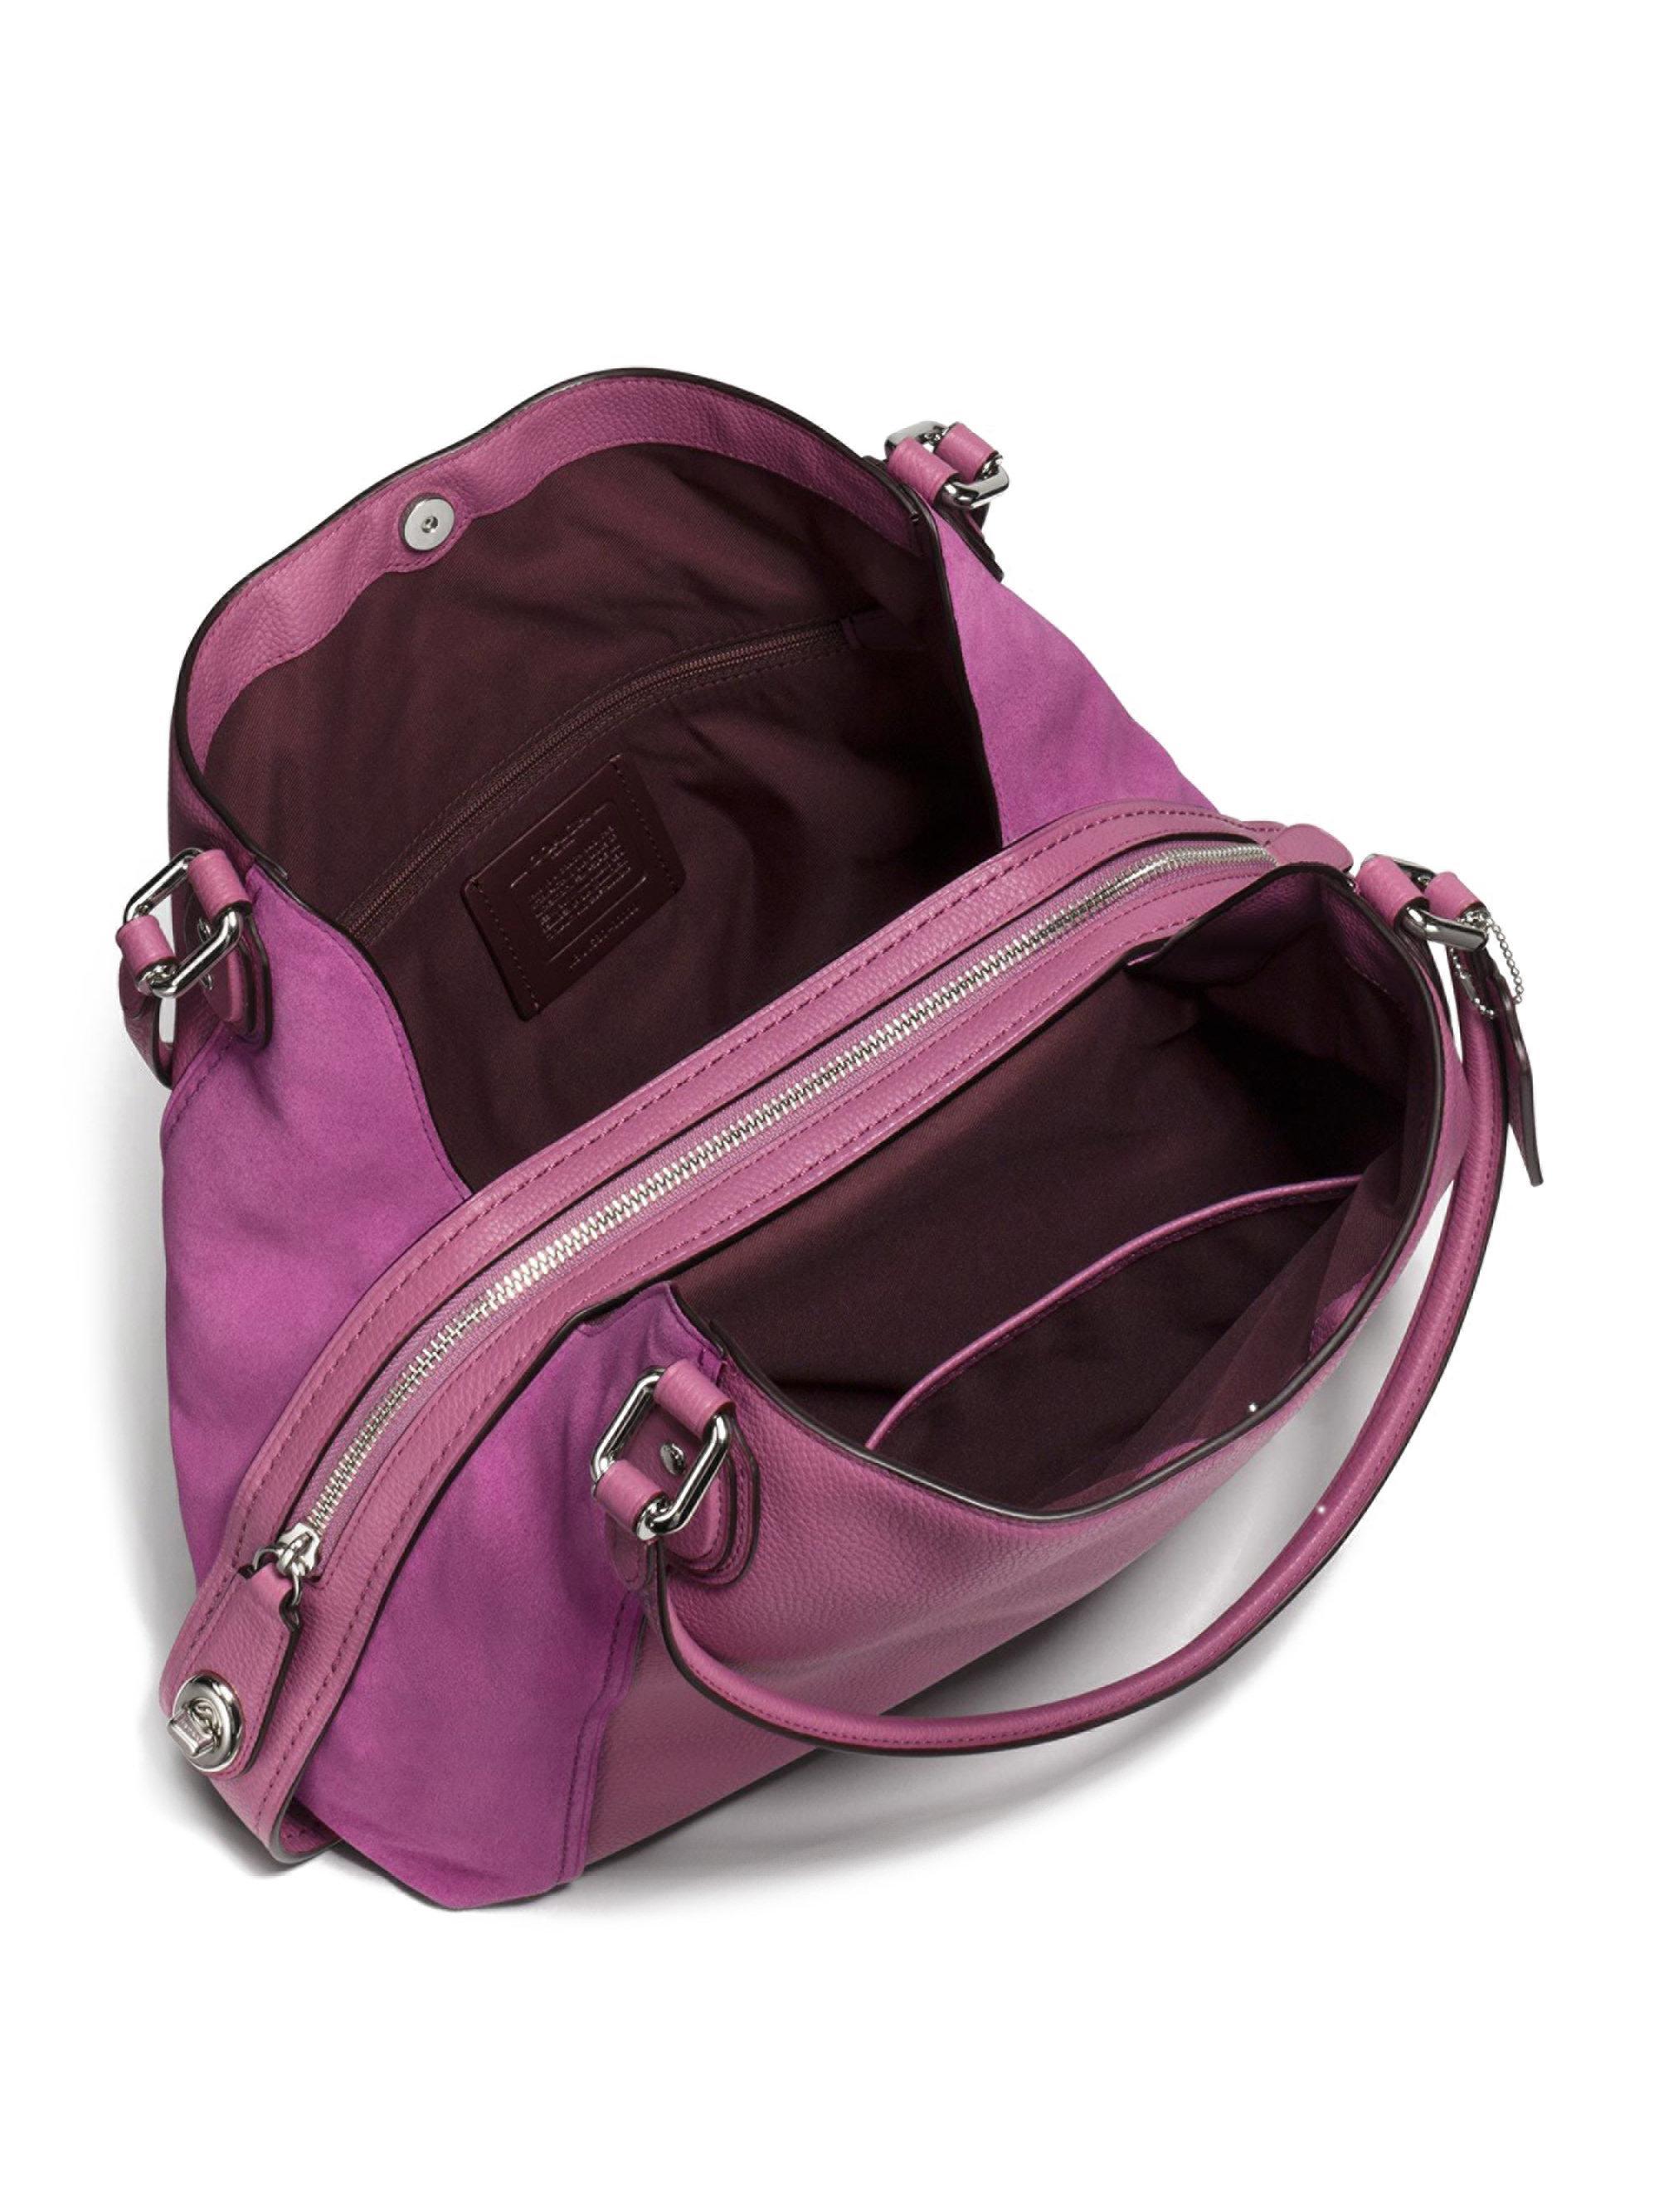 f4cab7f3fe ... store lyst coach edie leather suede shoulder bag in purple 4f3eb 94439